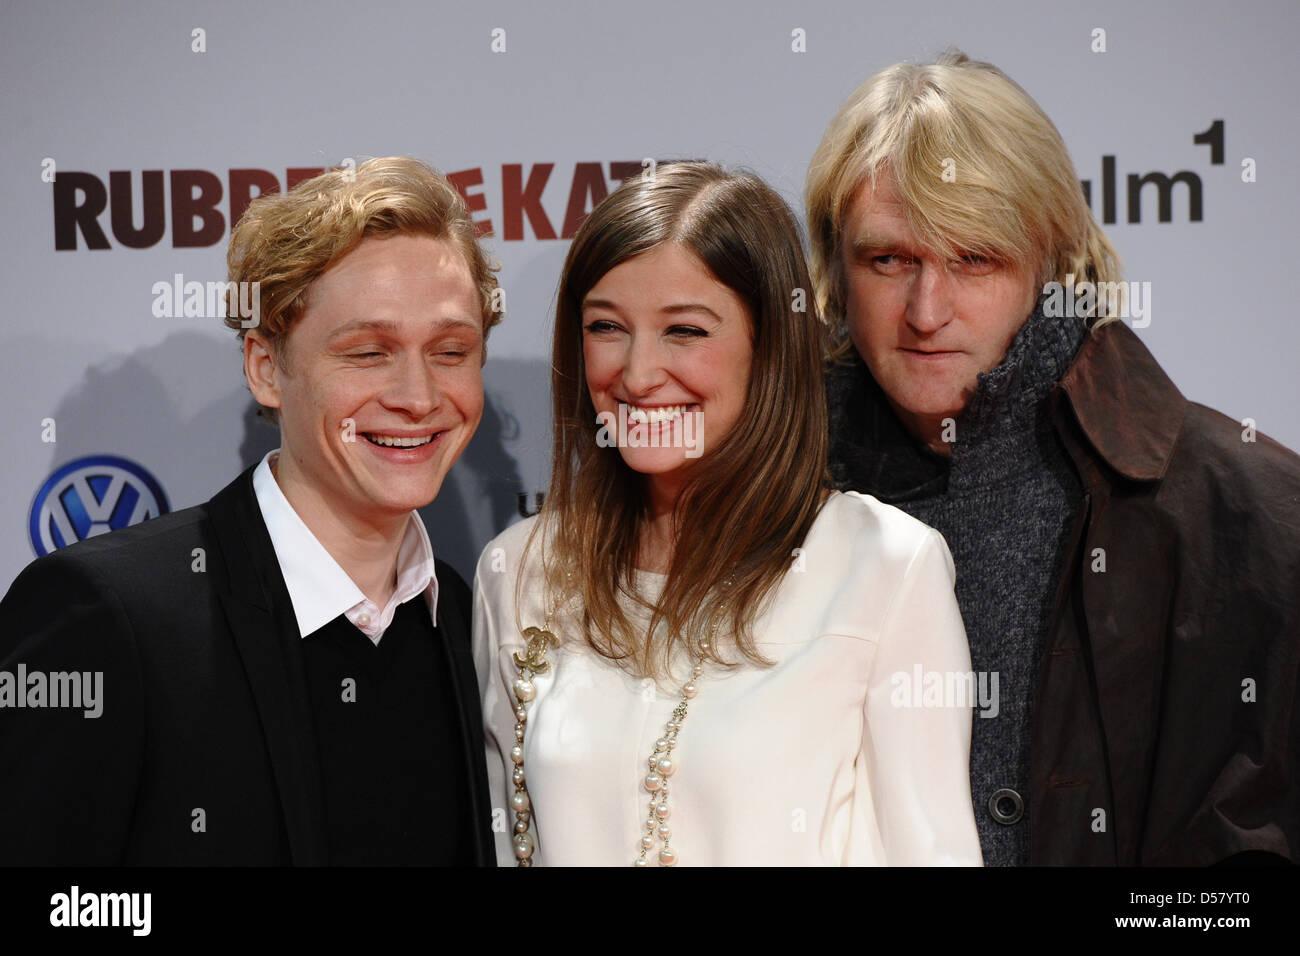 Matthias Schweighoefer And Alexandra Maria Lara And Detlev Buck The